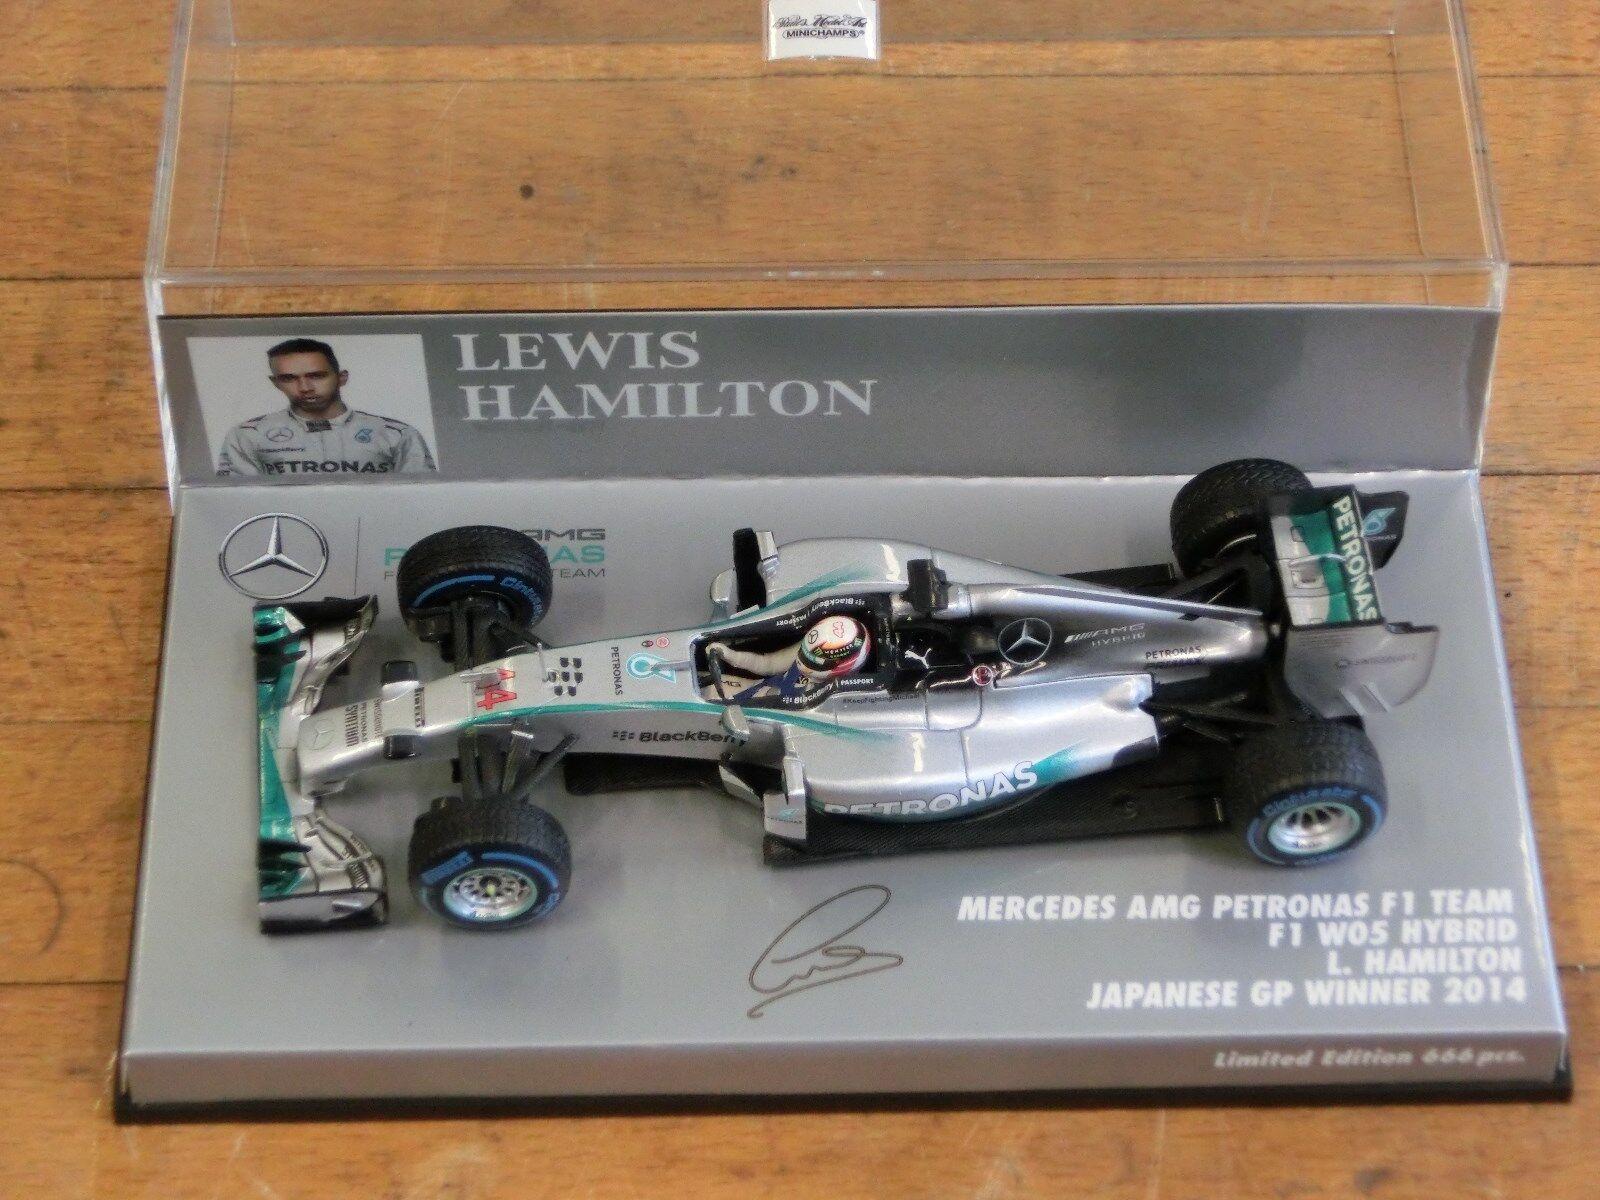 1/43 Minichamps Mercedes AMG W05 Japanese GP Winner 2014 Hamilton Rain Tyres